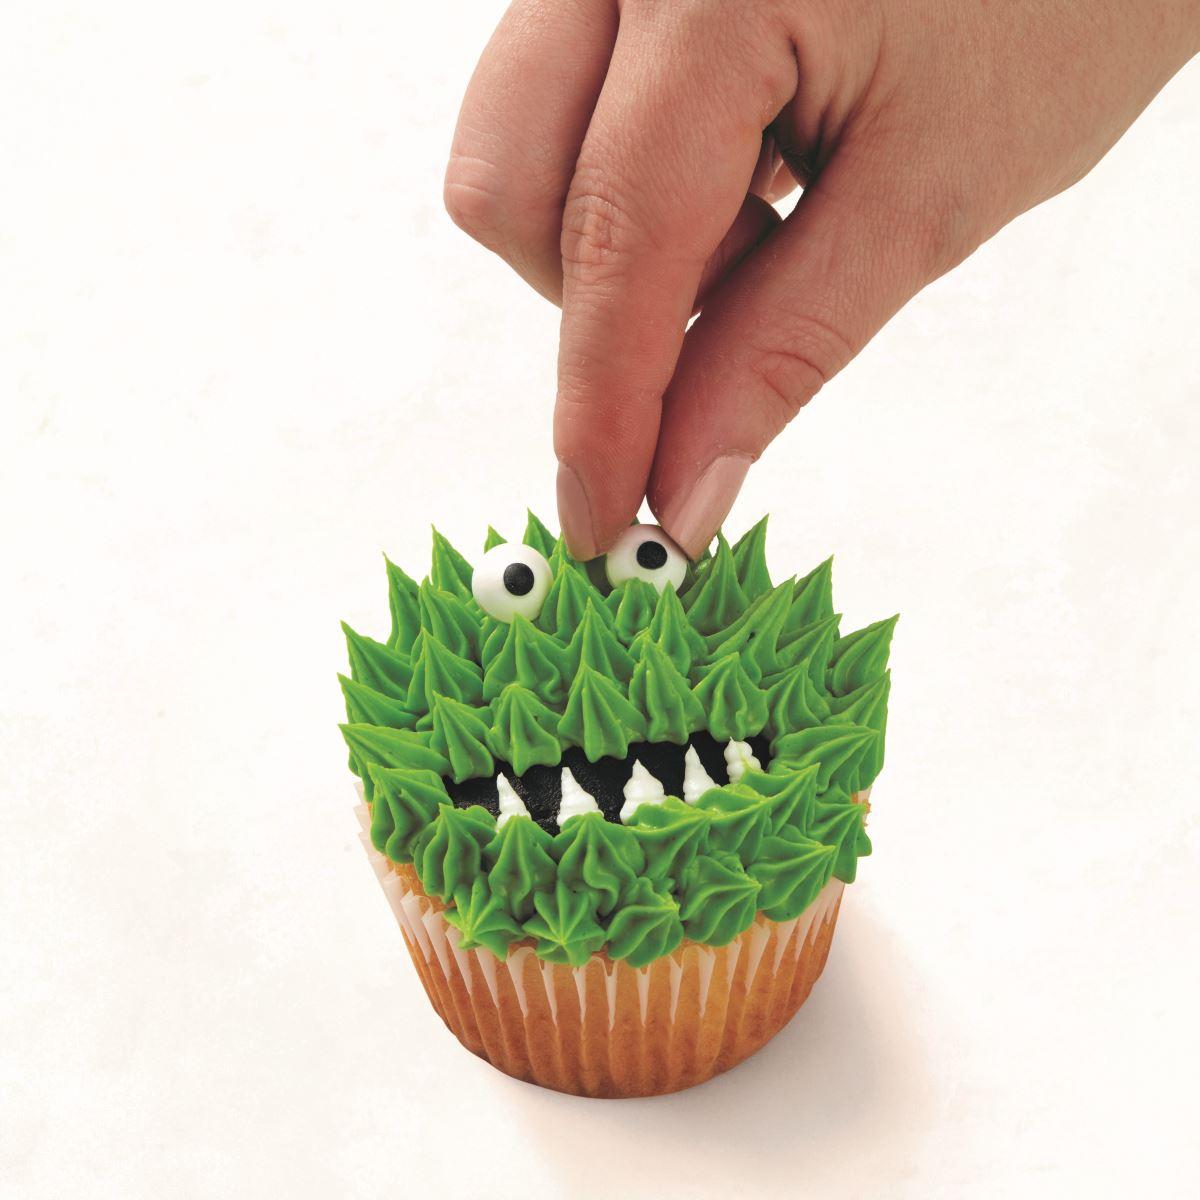 GREEN MONSTER CUPCAKE step 4